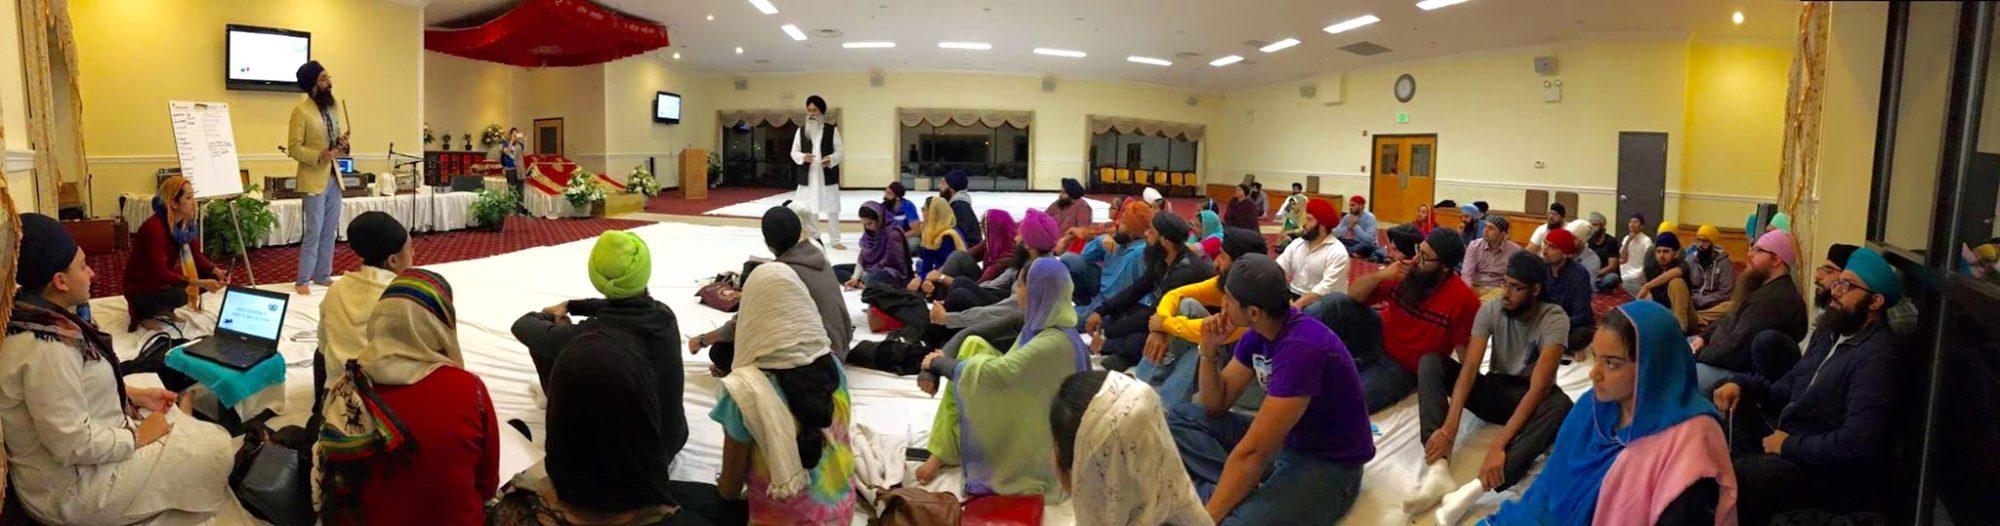 A Look into a Regional Sarbat Khalsa